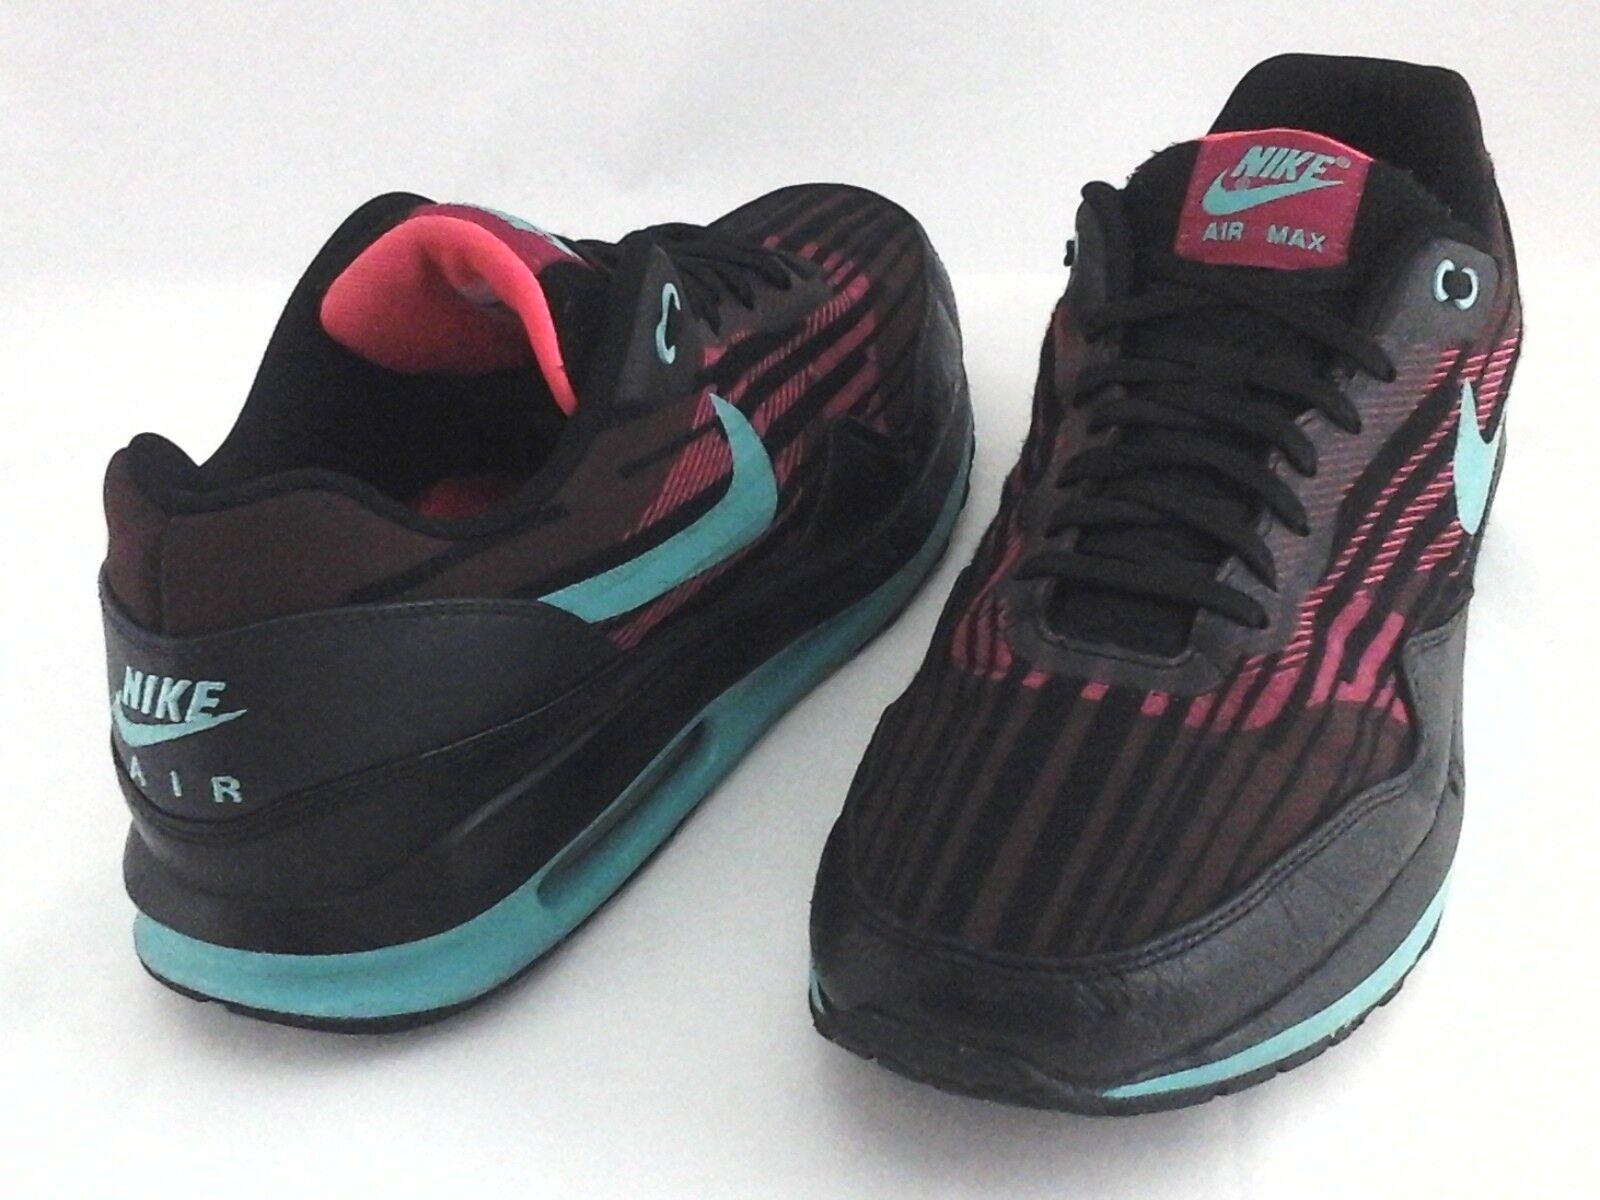 Zapatos Lunar  Nike Air Max Lunar Zapatos 1 Lunarlon Cedro/Hyper Jade Zapatillas para hombre US 12/46 2018 f028f4